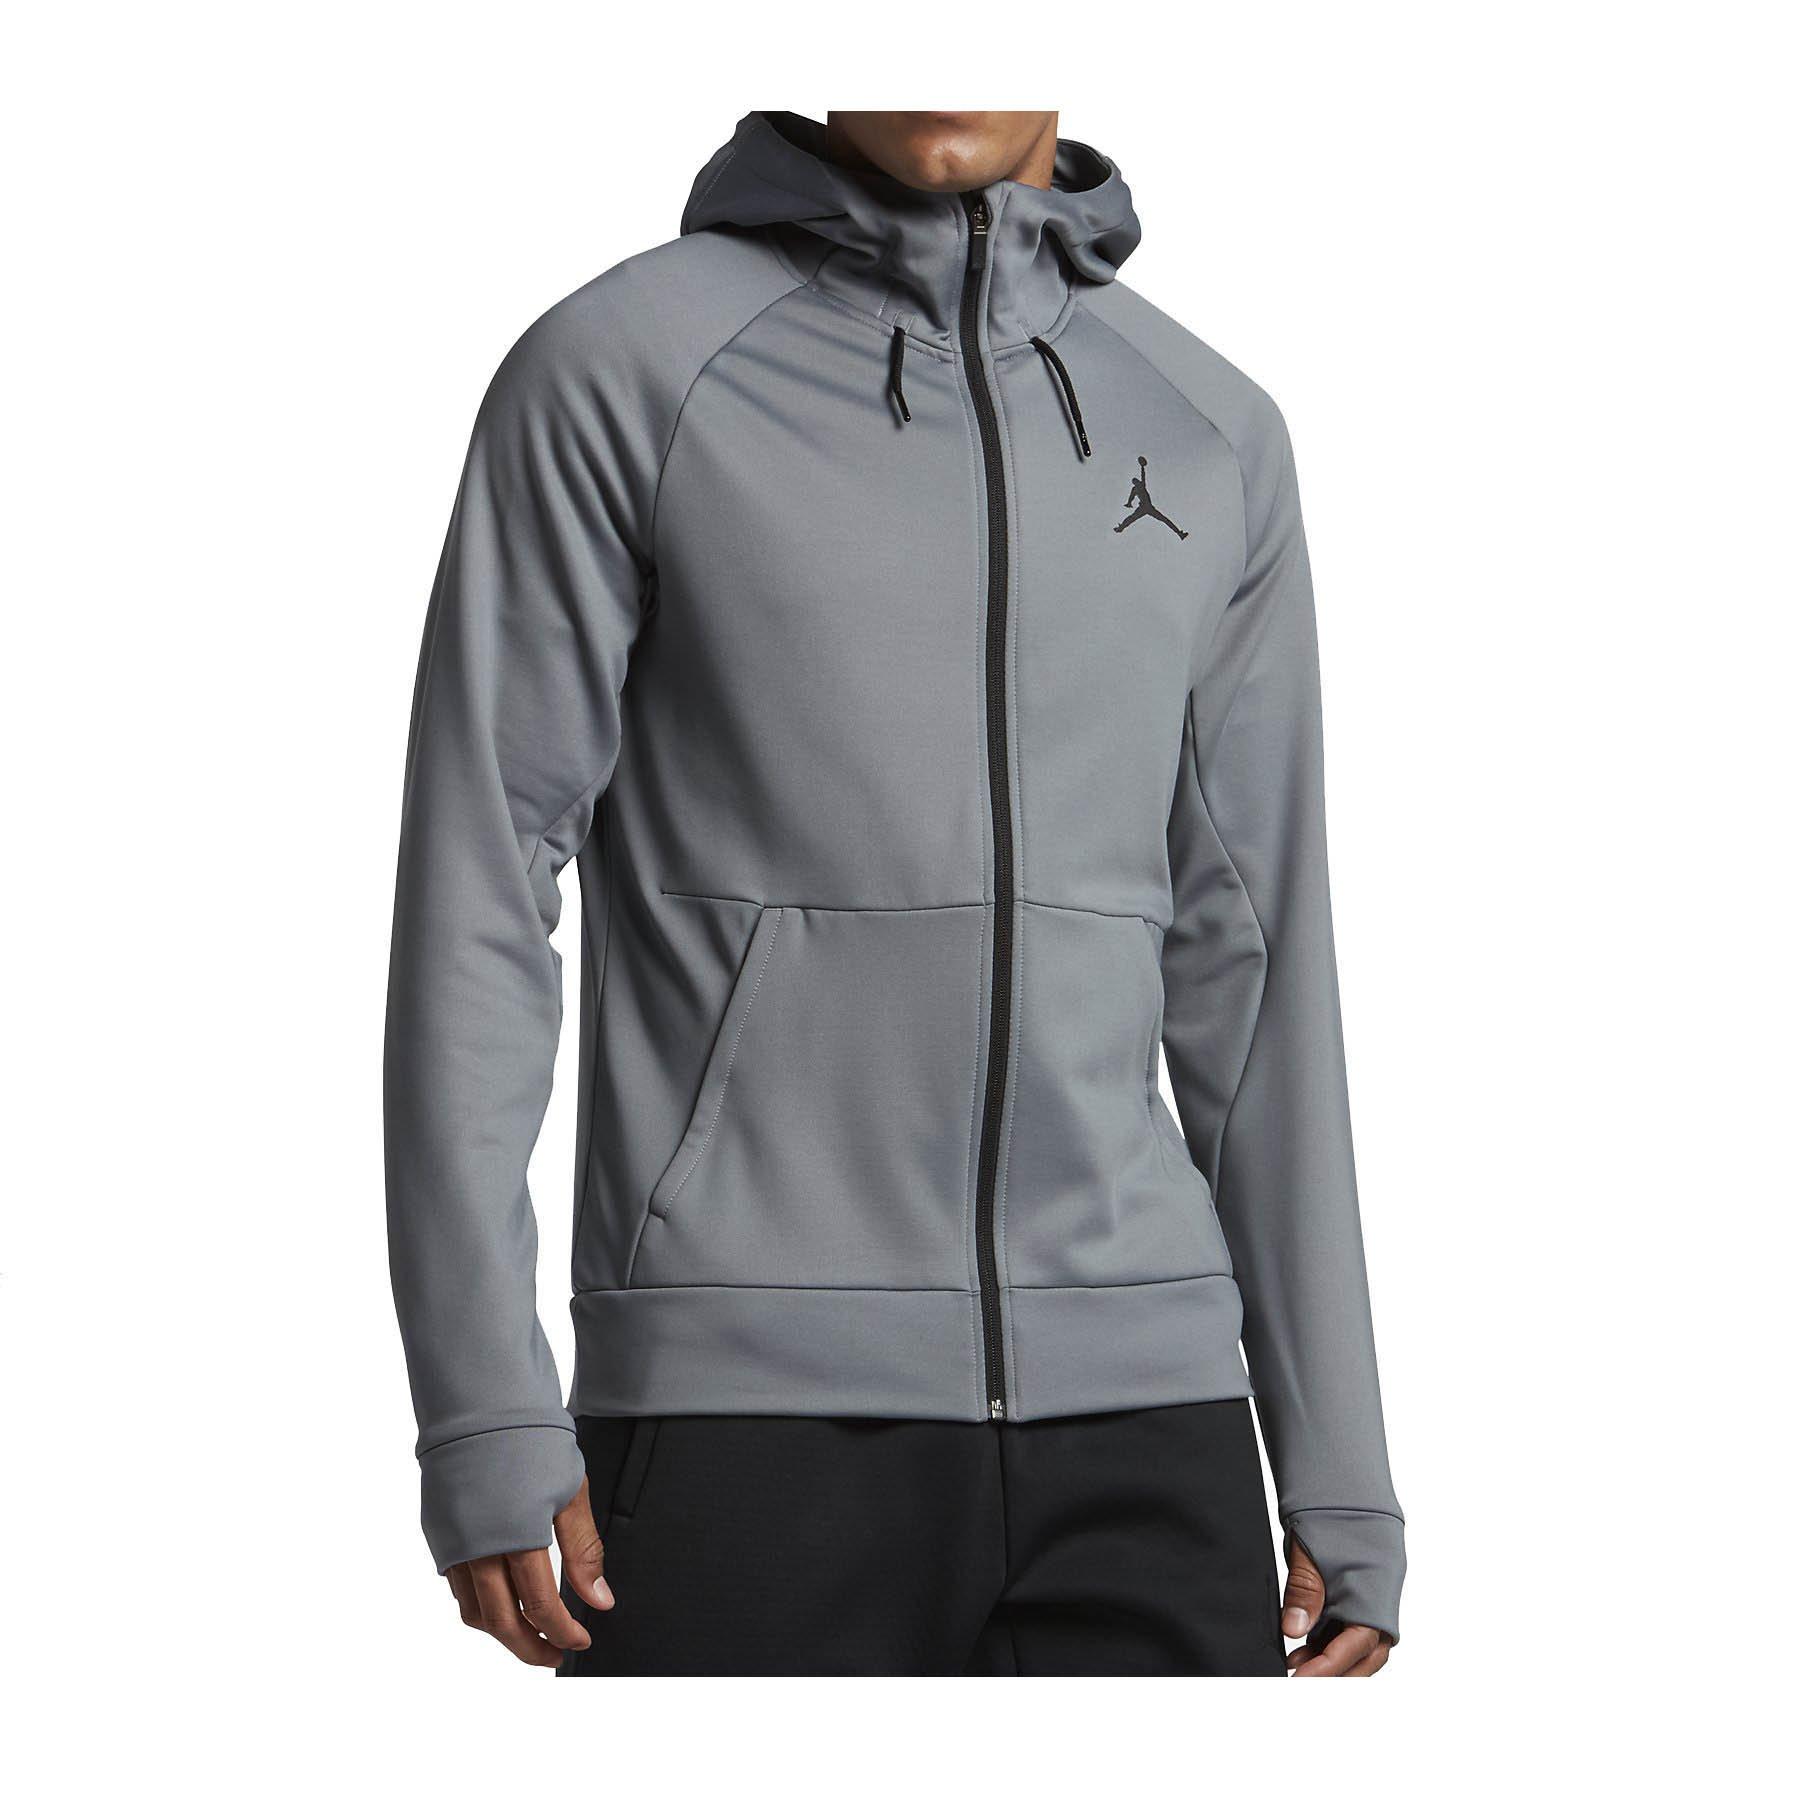 Nike Mens Jordan 360 Fleece Full Zip Hooded Sweatshirt Cool Grey/Black 808690-065 Size 2X-Large by NIKE